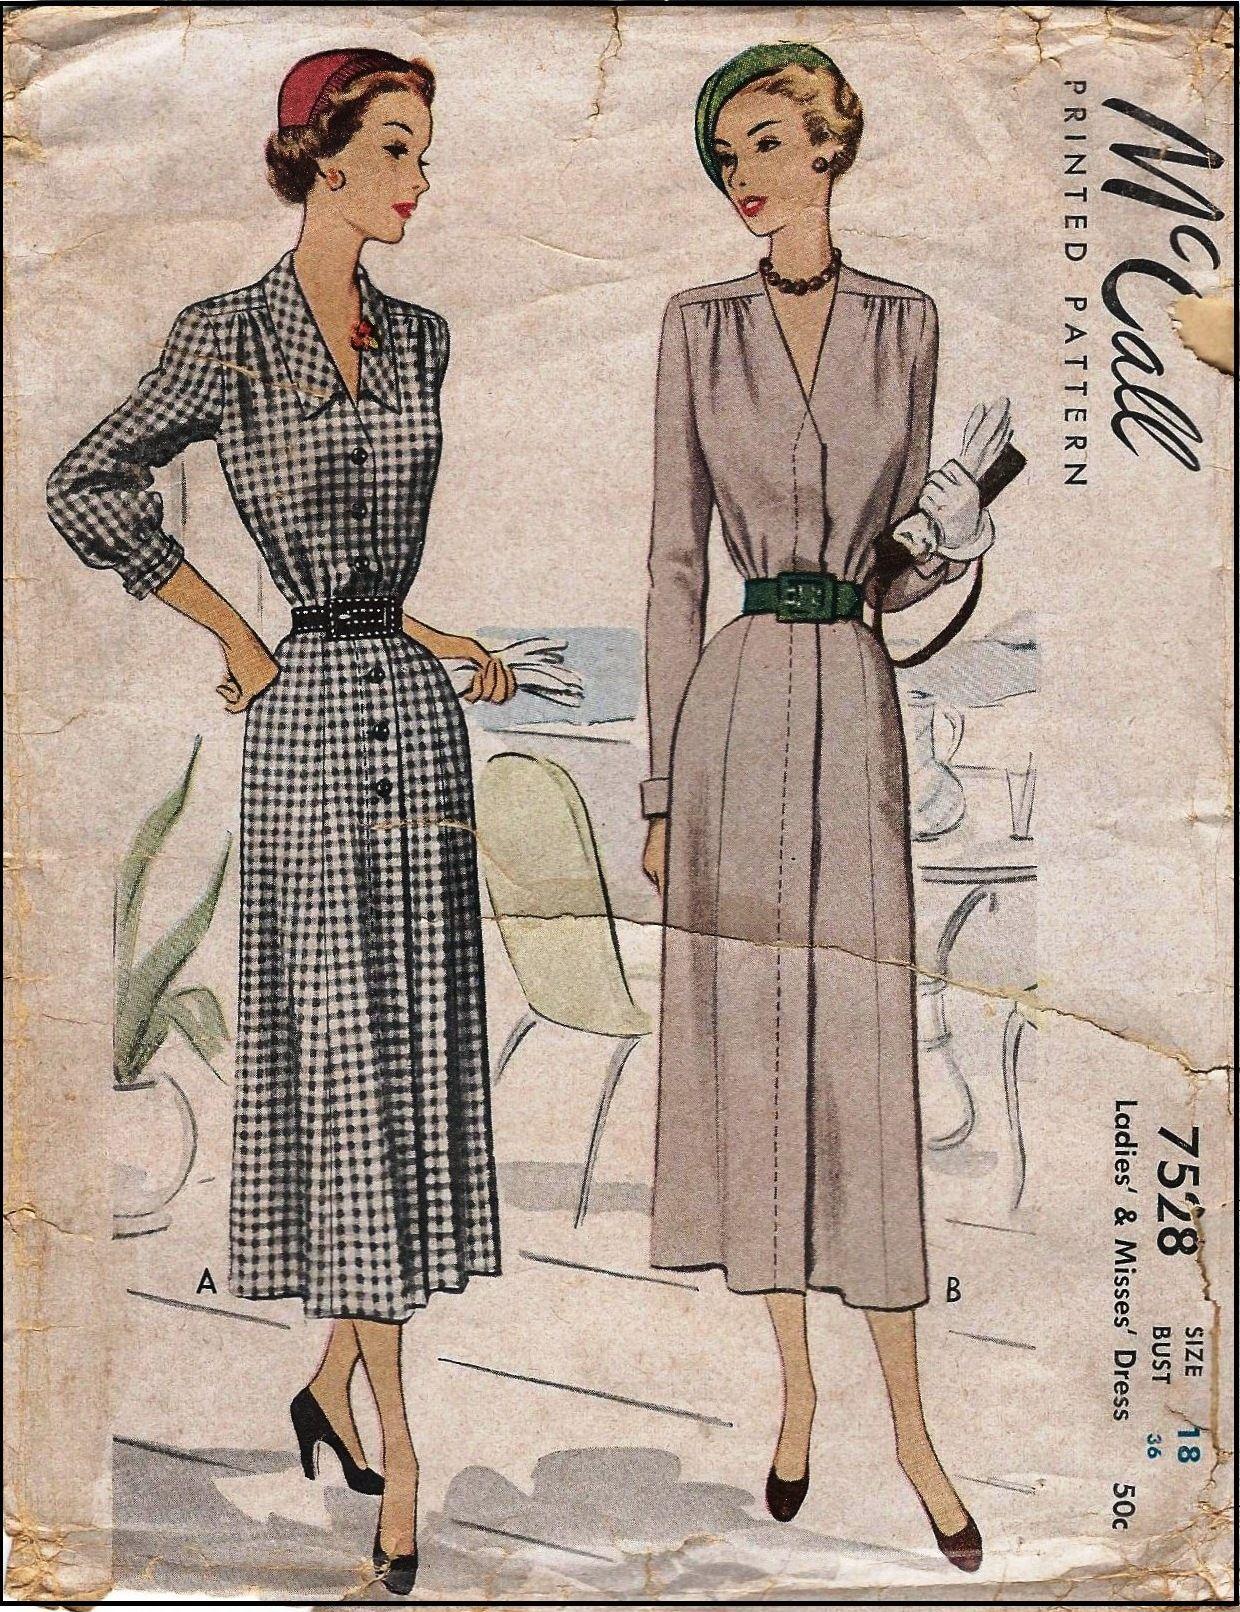 1949 ladies dress sewing pattern mccall 7528 pattern stuff 1949 ladies dress sewing pattern mccall 7528 jeuxipadfo Choice Image